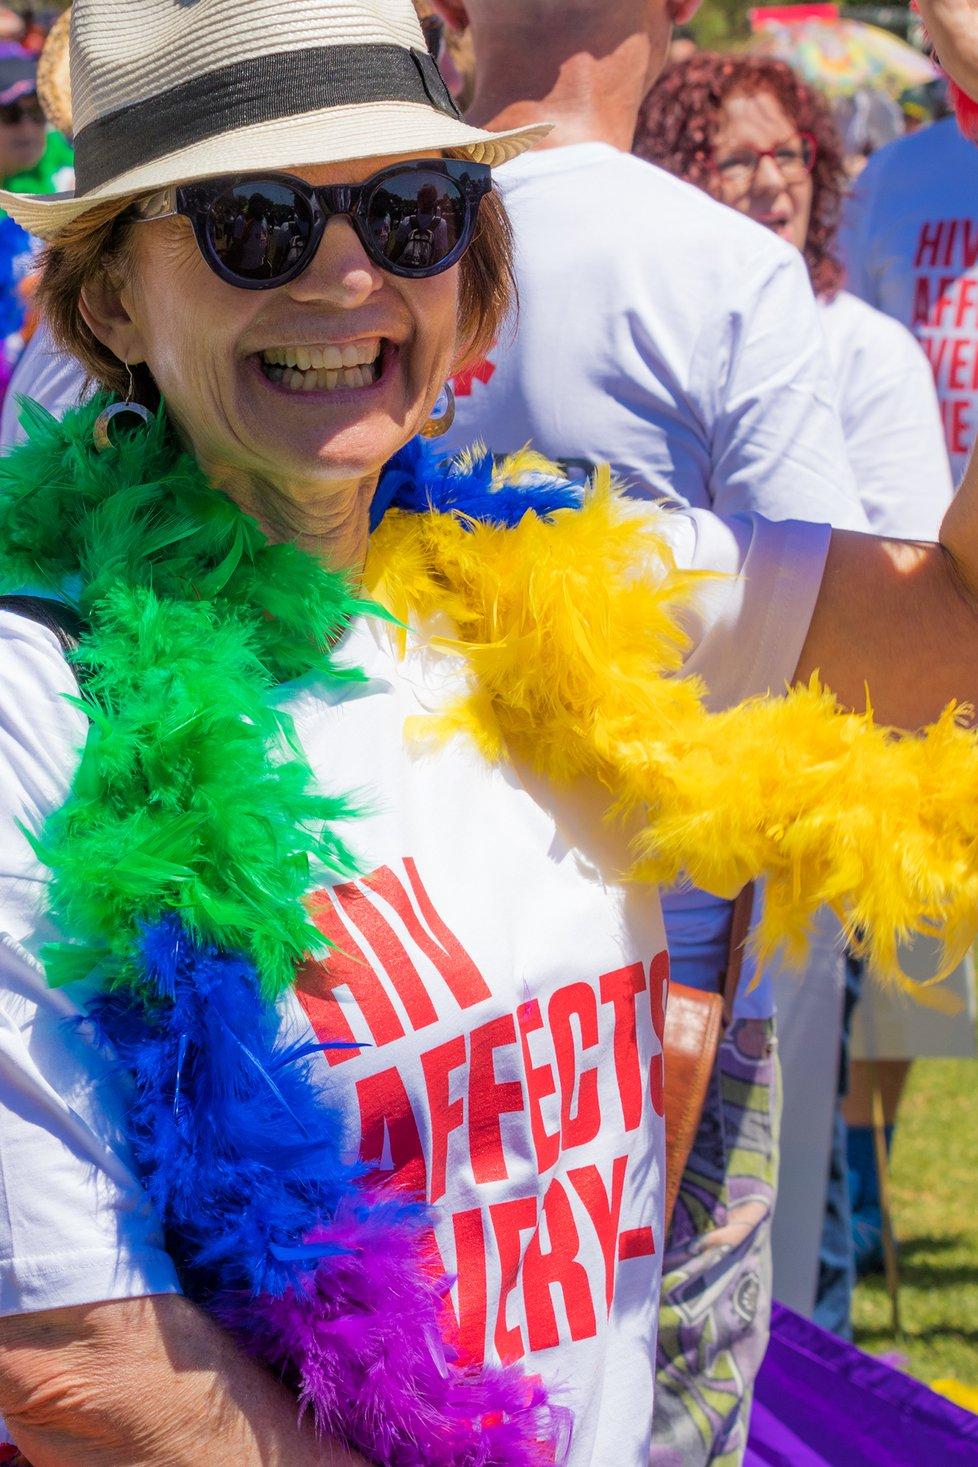 20170202_Pride March_Paul Rees_RE-SIZED_002.jpg